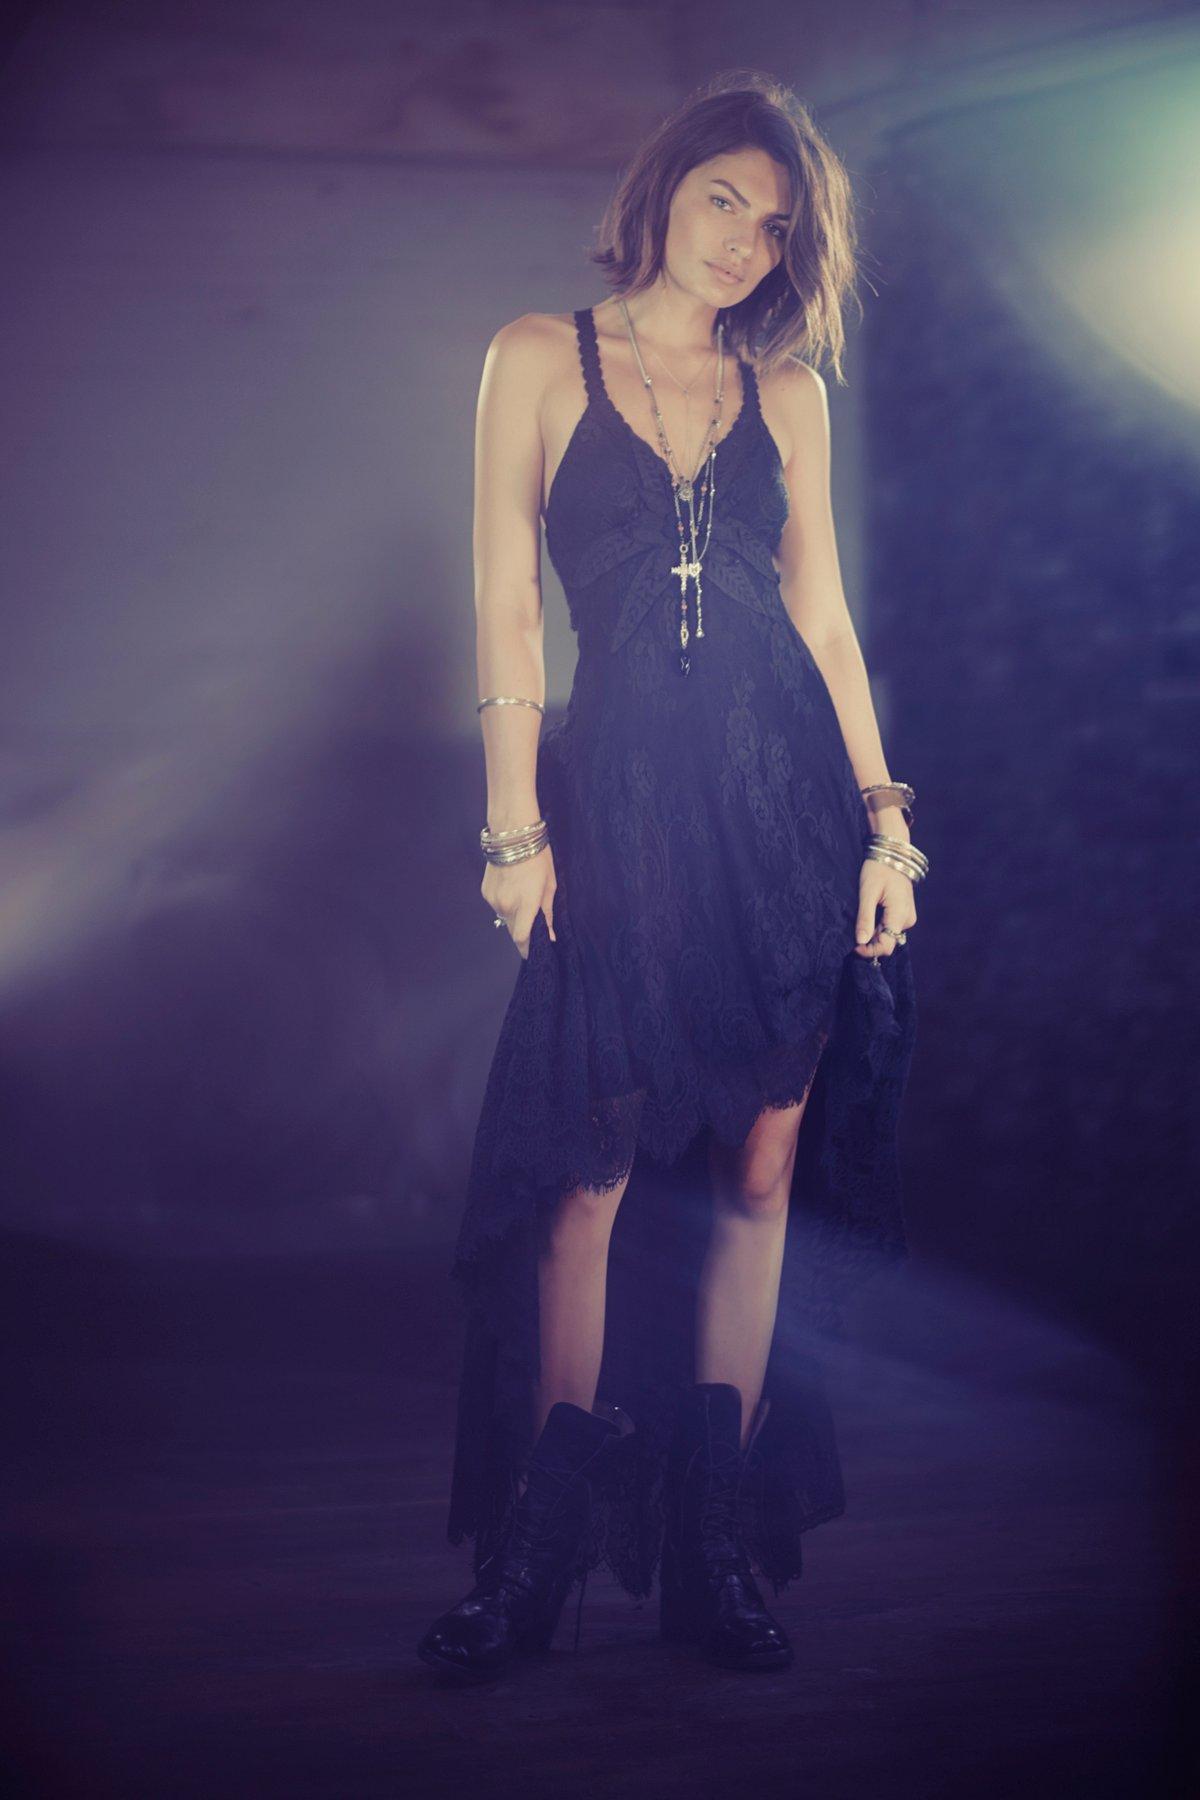 Alissa's Limited Edition Dress